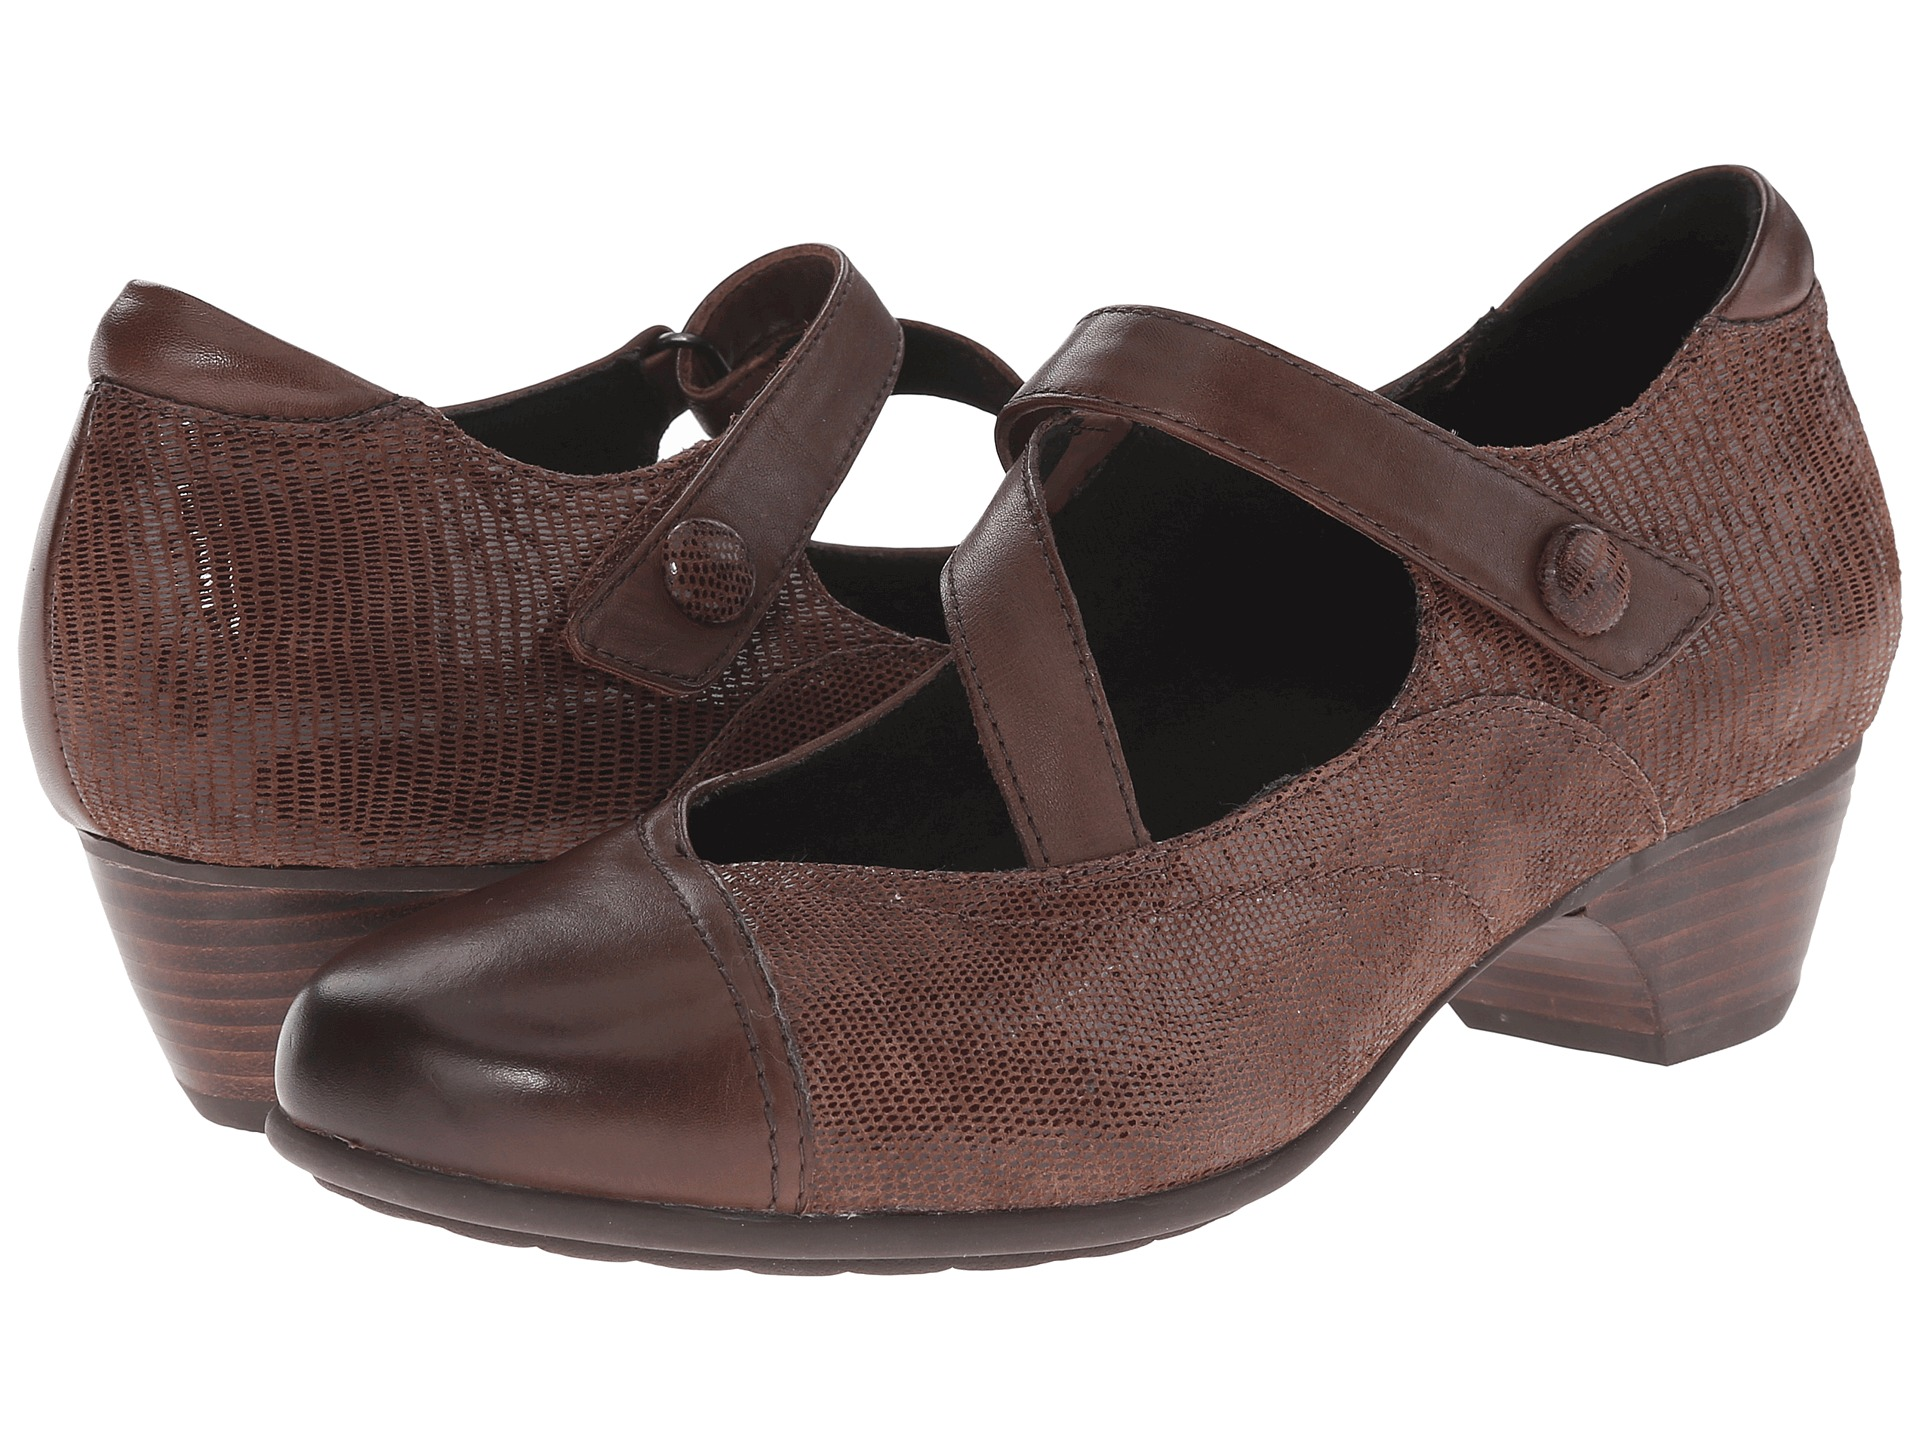 Zappos Womens Shoe Sale